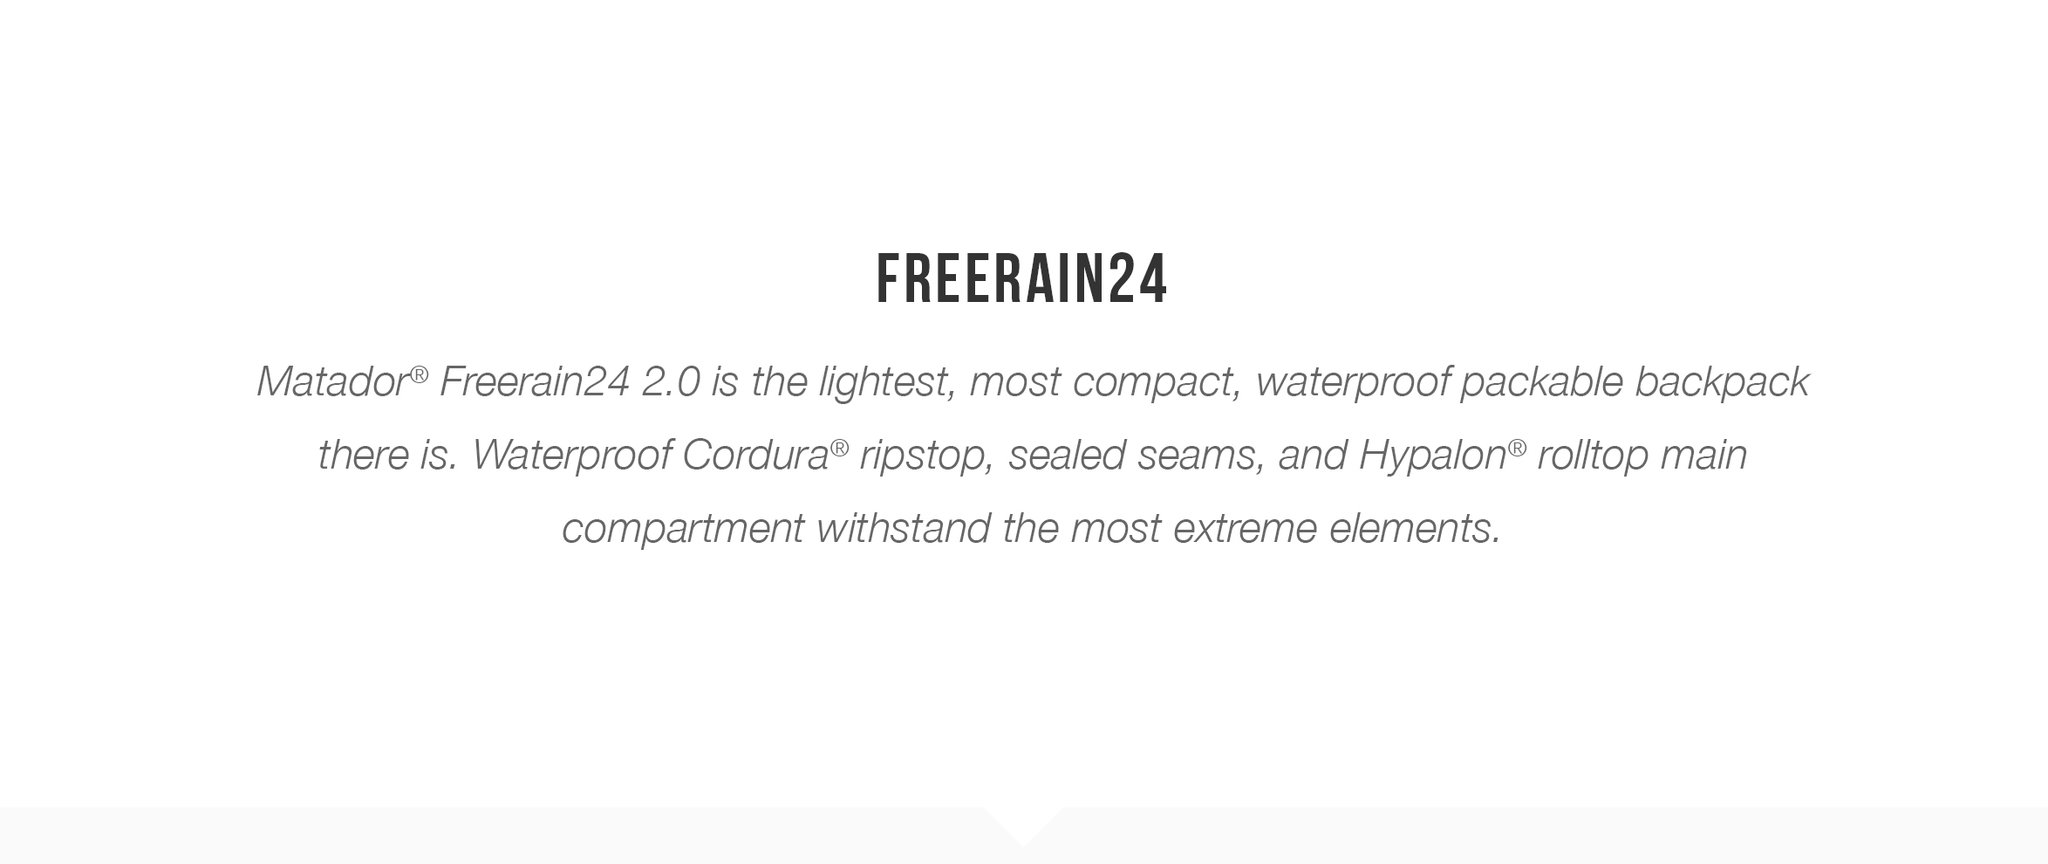 Freerain24_1.1_2048x2048.jpg